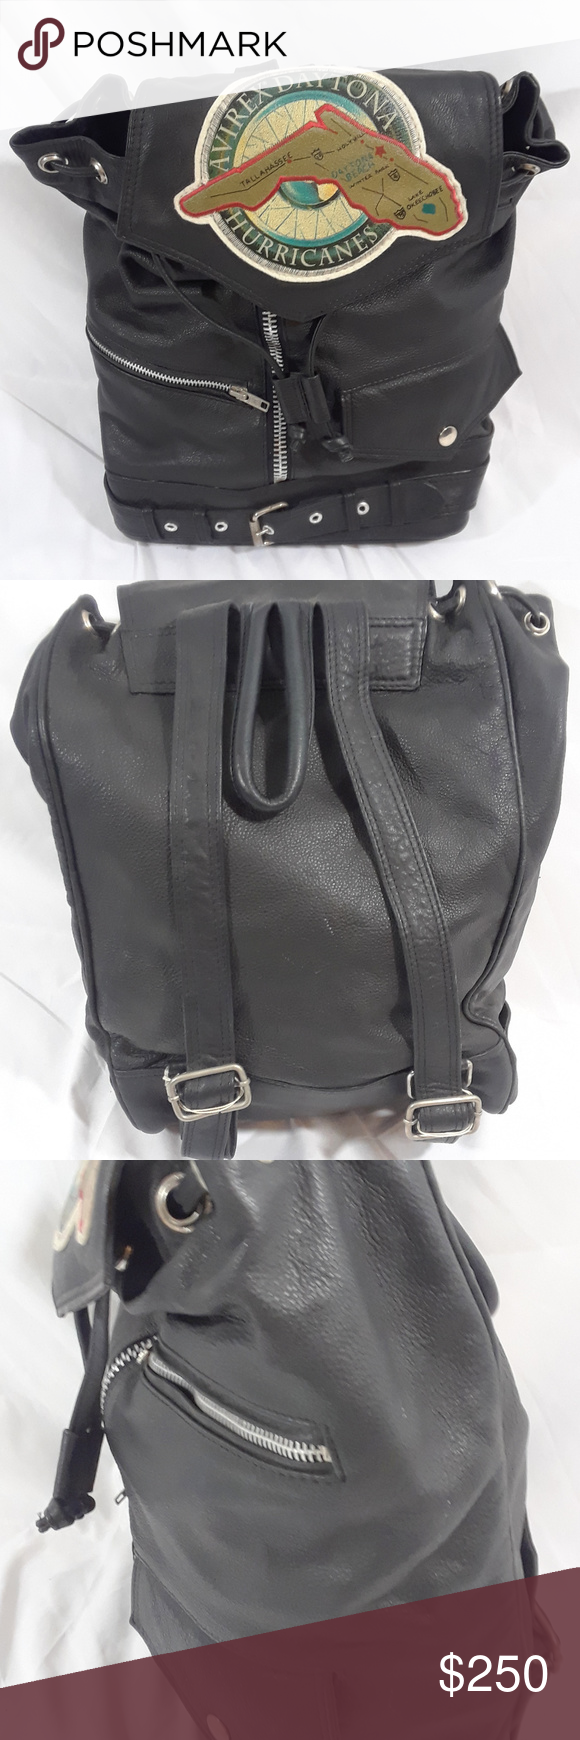 Avirex Daytona Hurricanes Leather Flight Backpack Clothes Design Fashion Fashion Trends